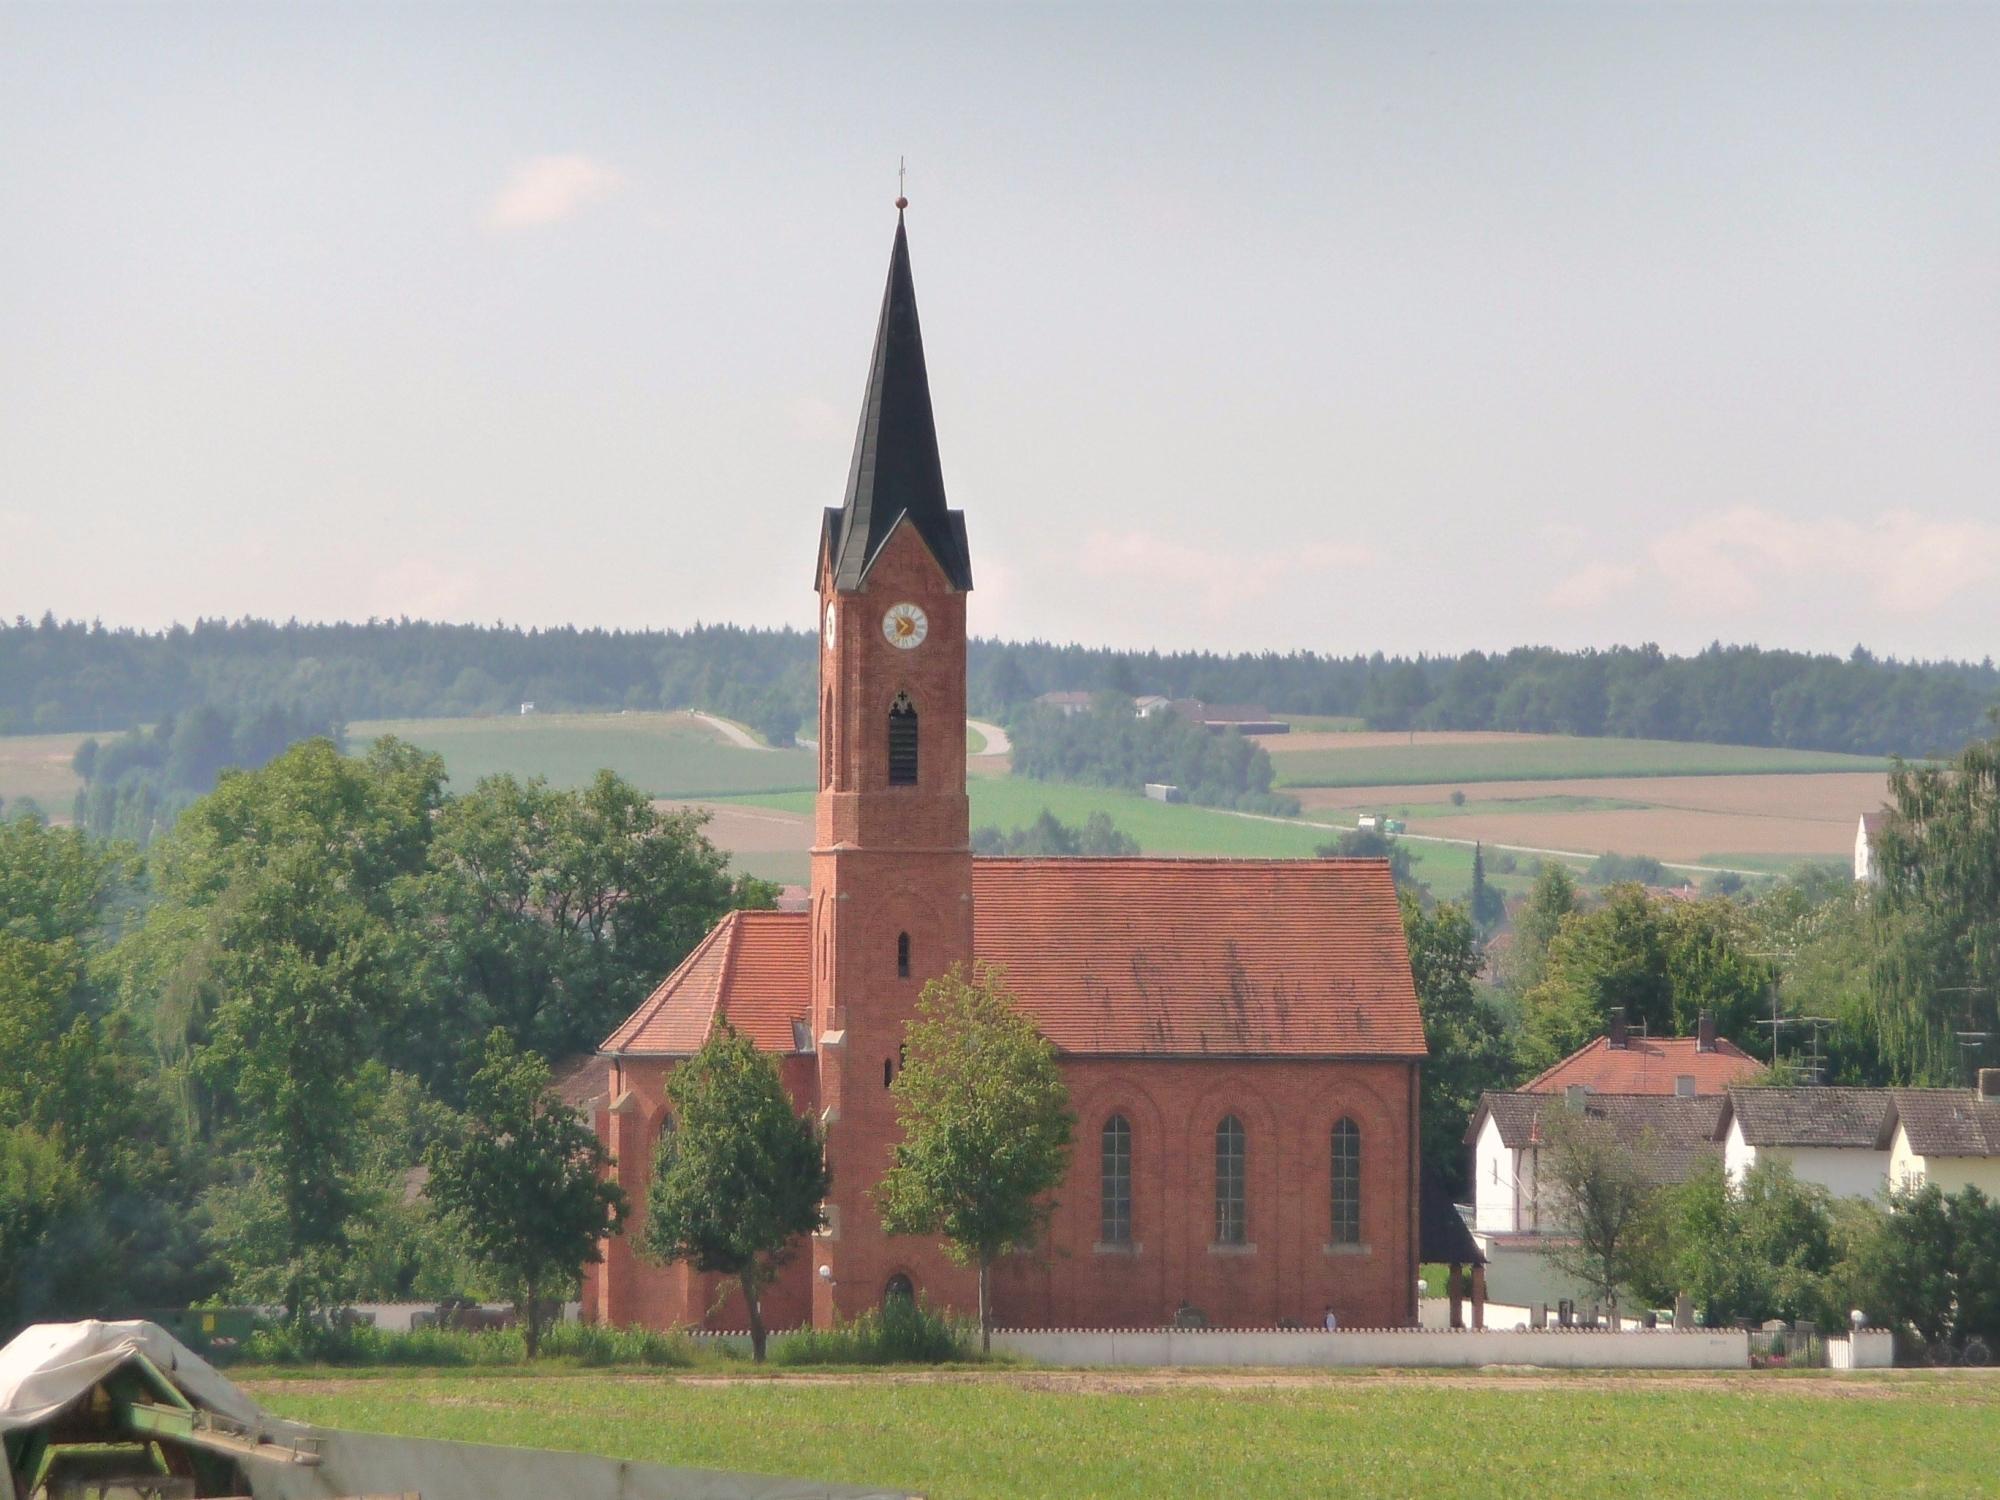 Pfarrkirche Mettenhausen